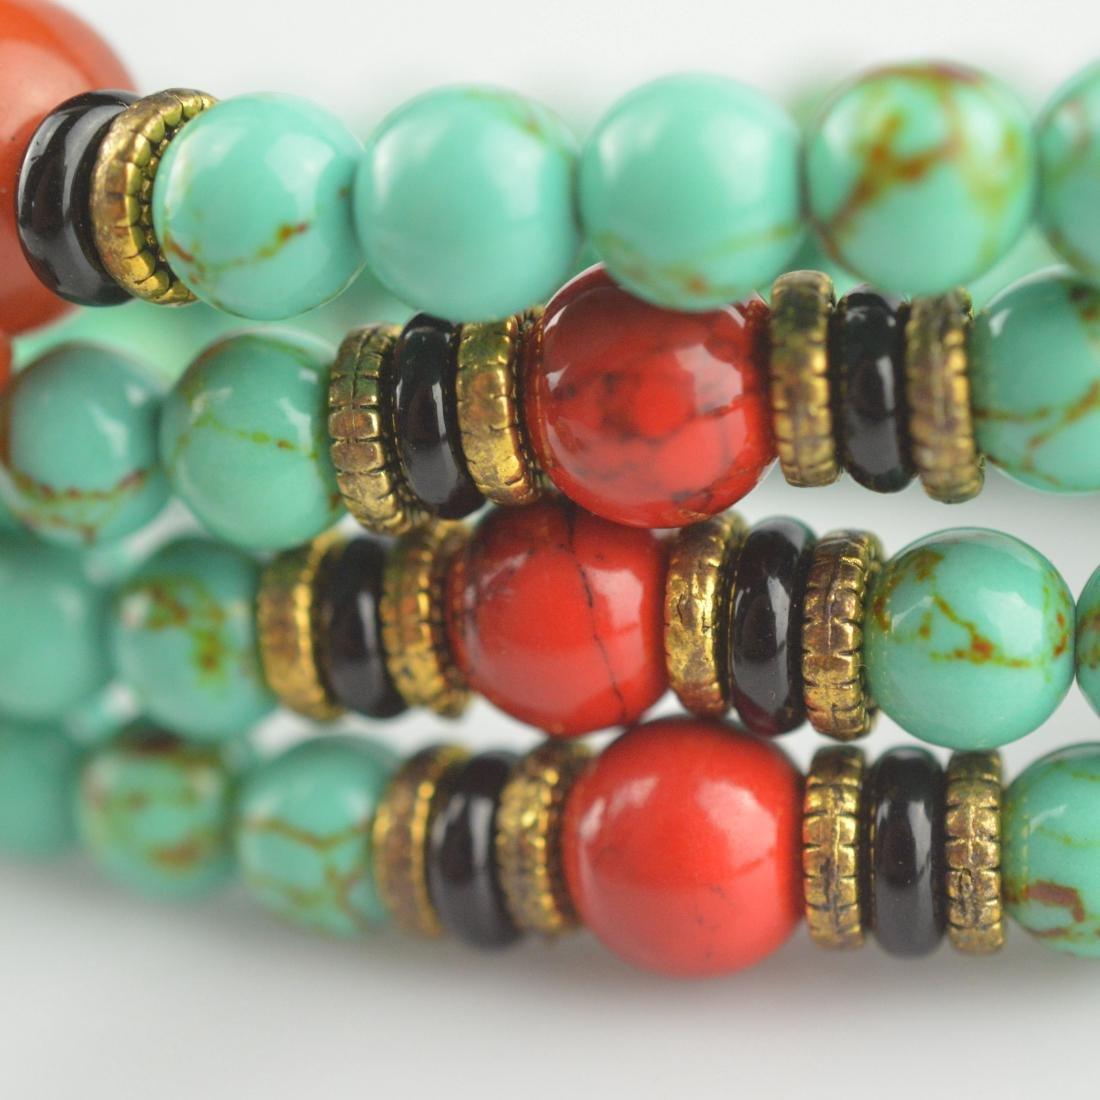 Turquoise Bead Prayer Necklace - 2